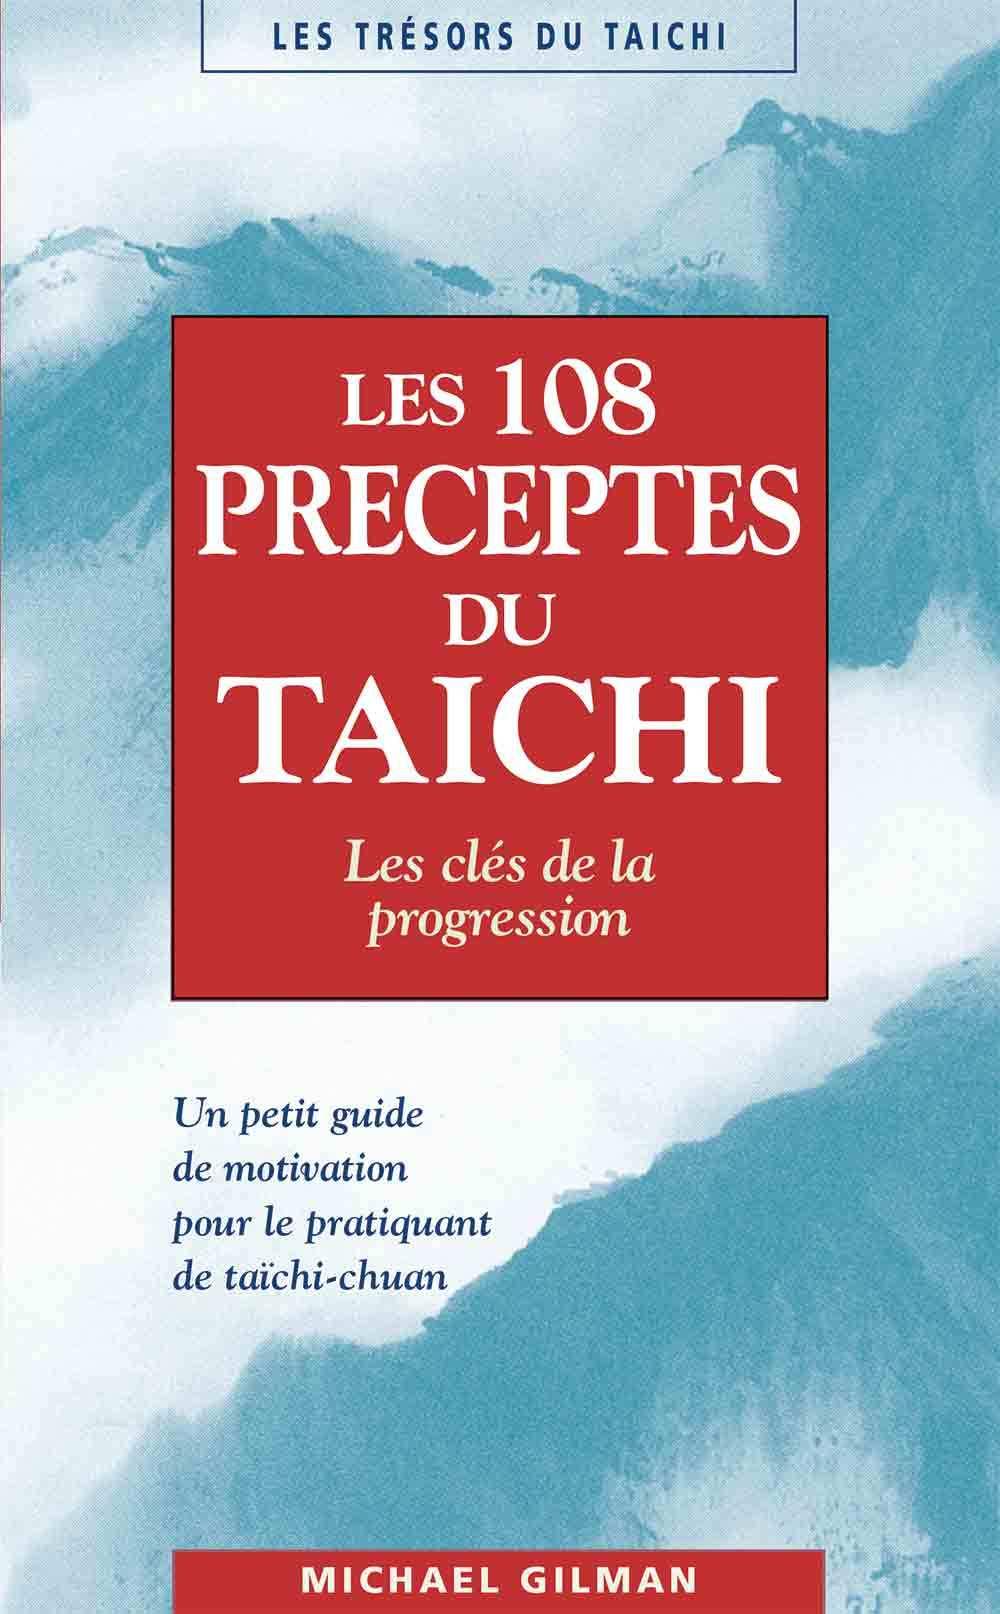 108 PRECEPTES DU TAICHI (LES)